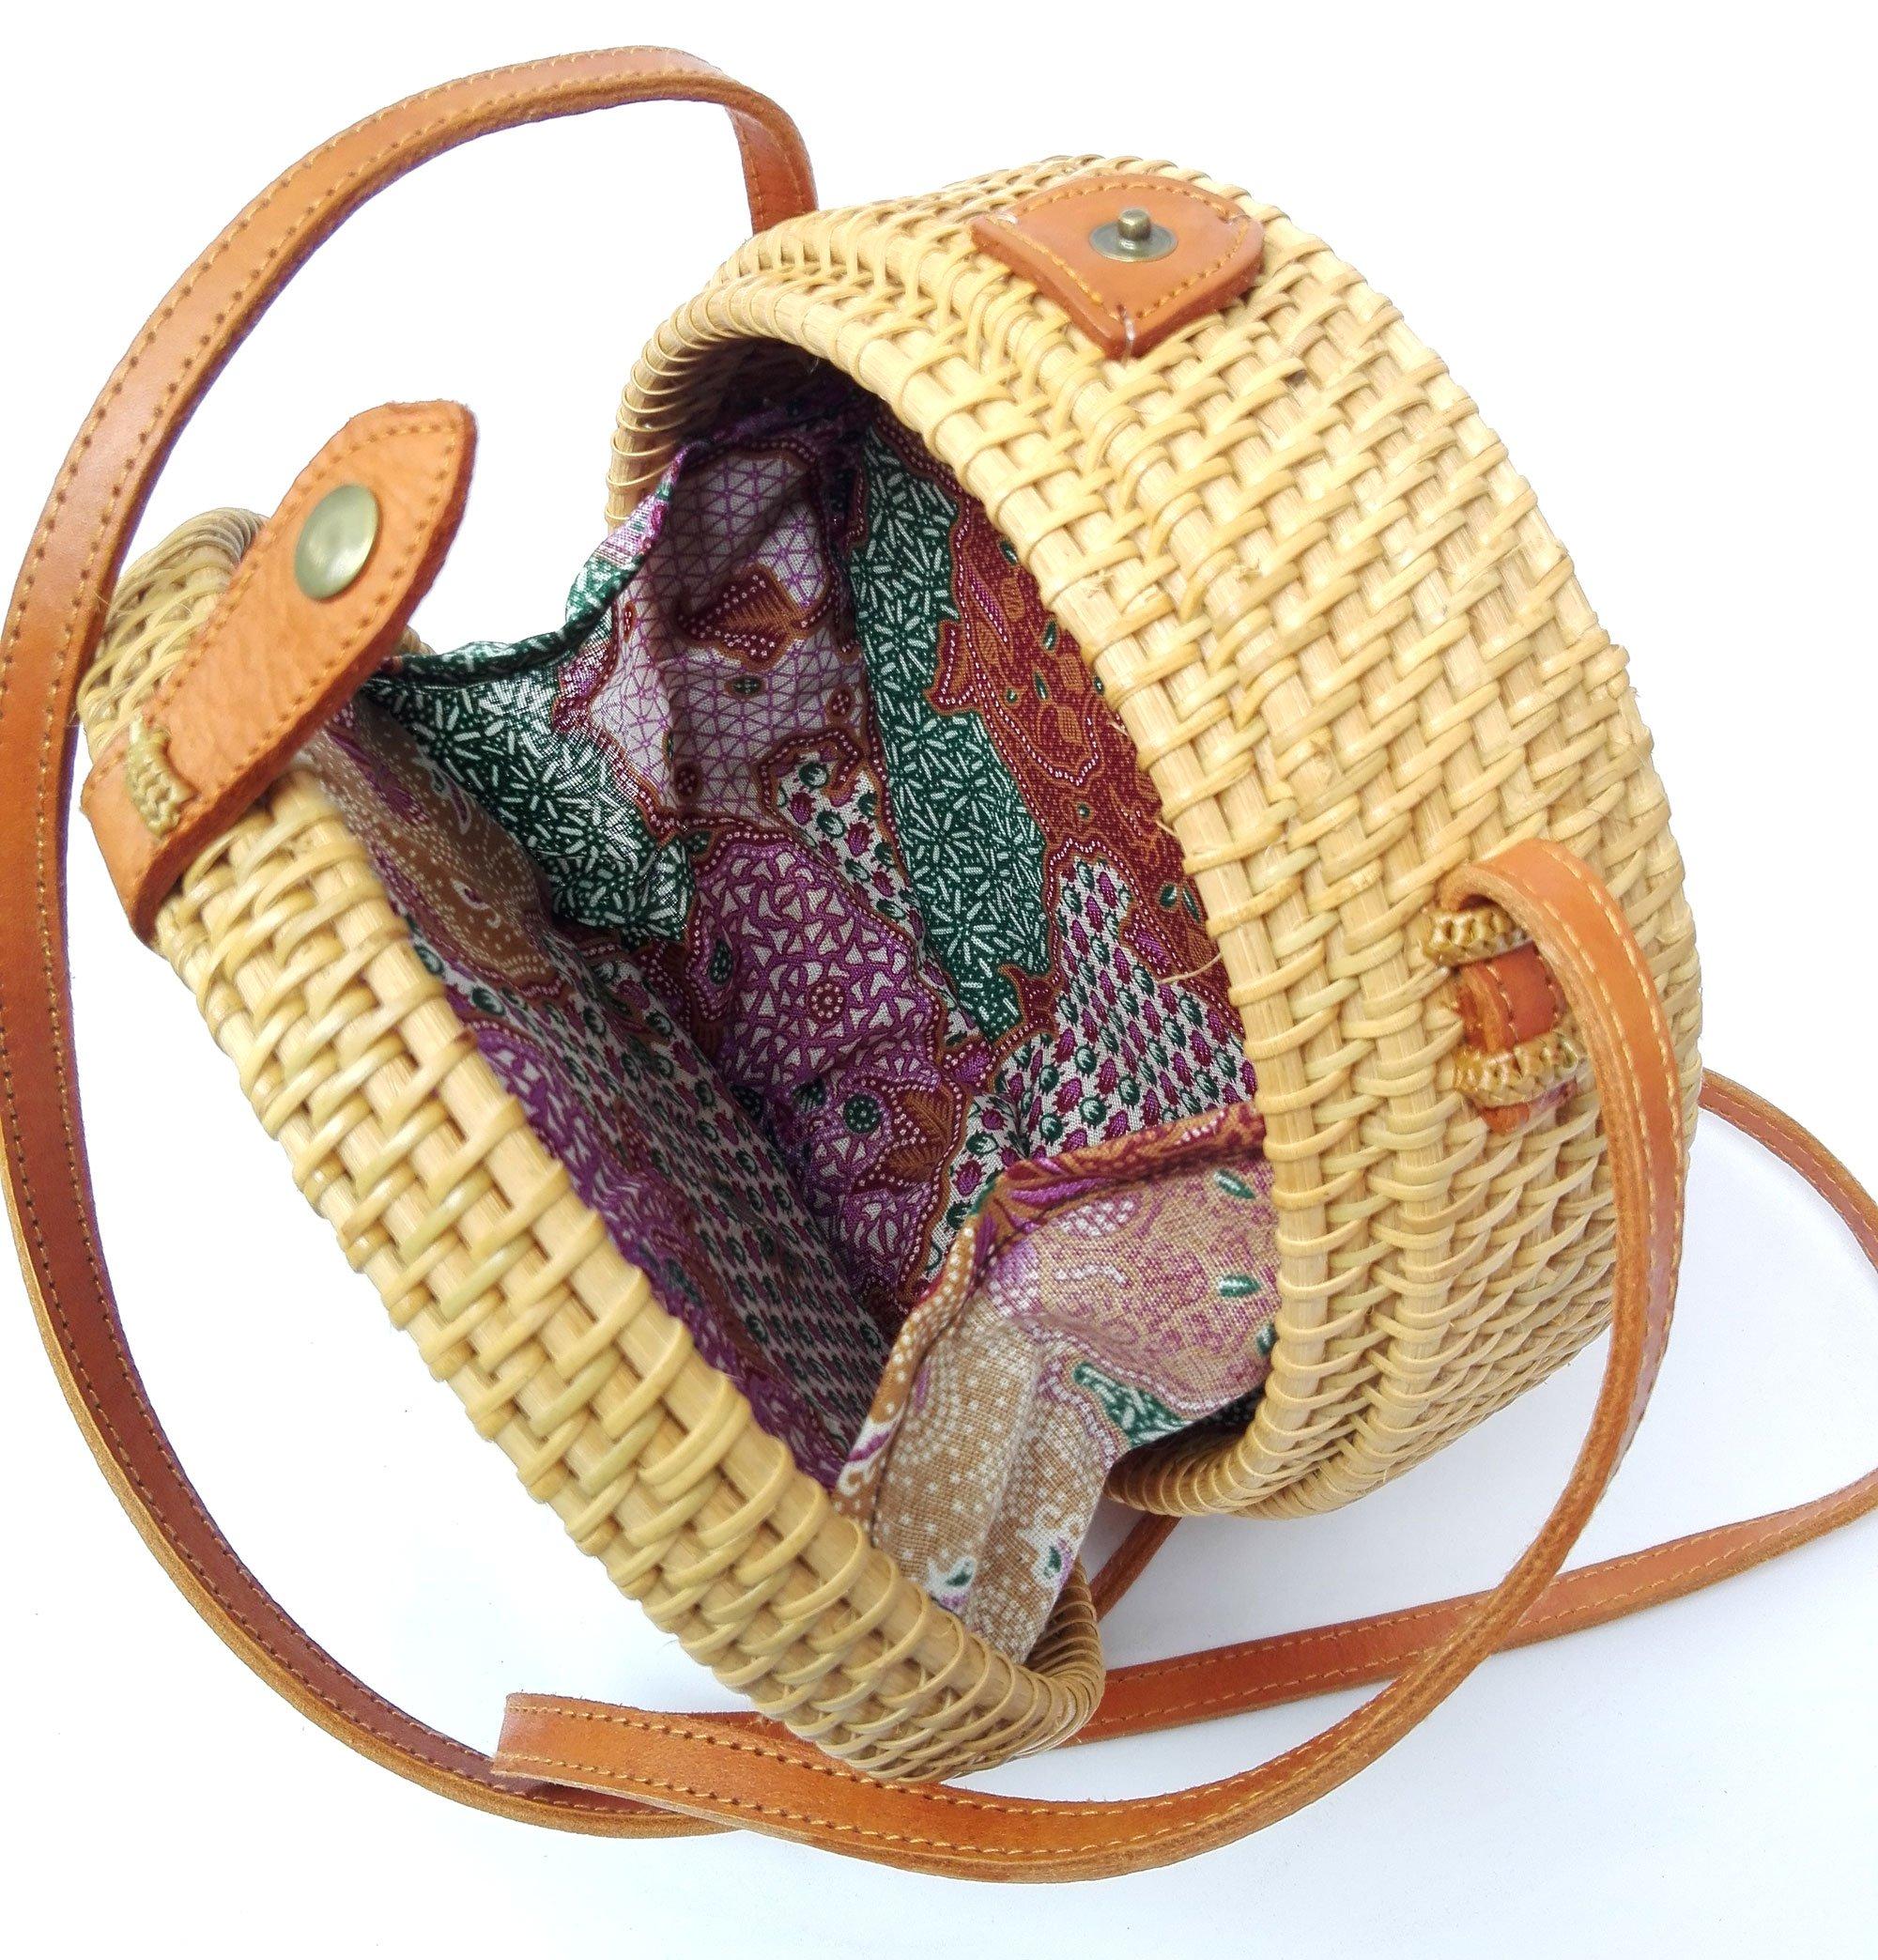 Bali Rattan - Handwoven Round Rattan Bag (Plain Weave Leather Closure) by Bali Rattan (Image #5)